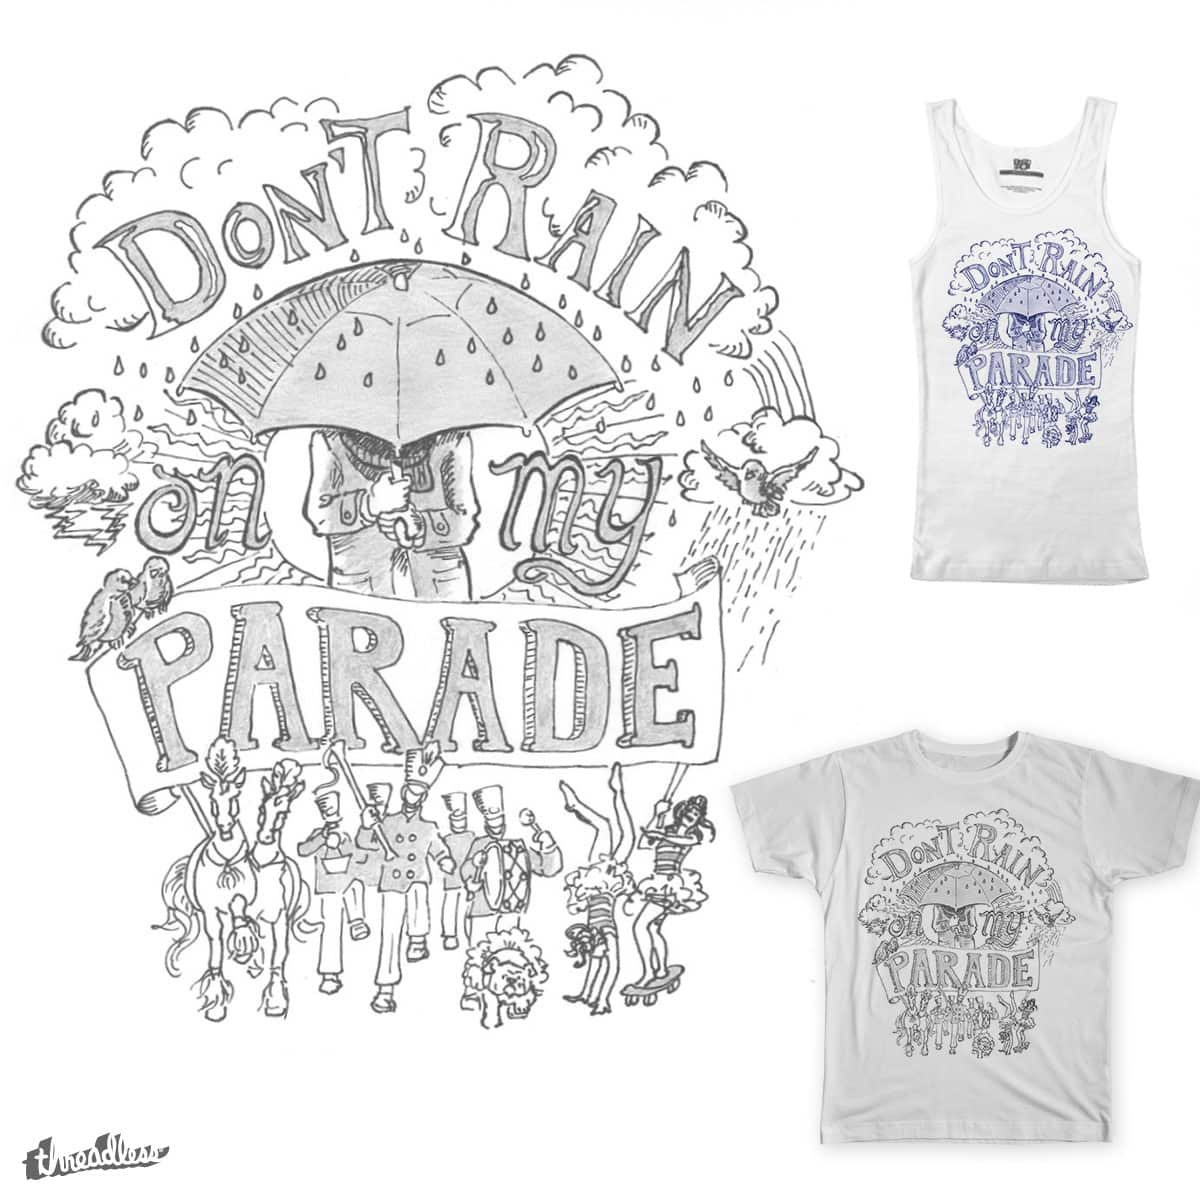 Don't Rain on my Parade by ShannonAsja  on Threadless